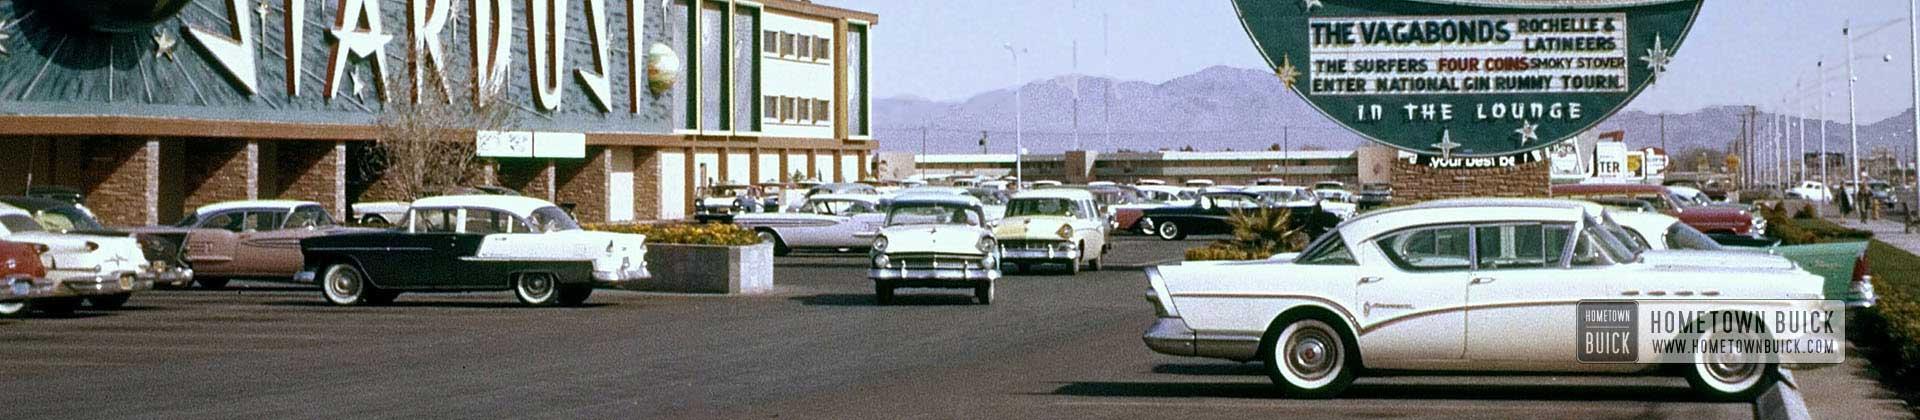 1957 Buick Slider